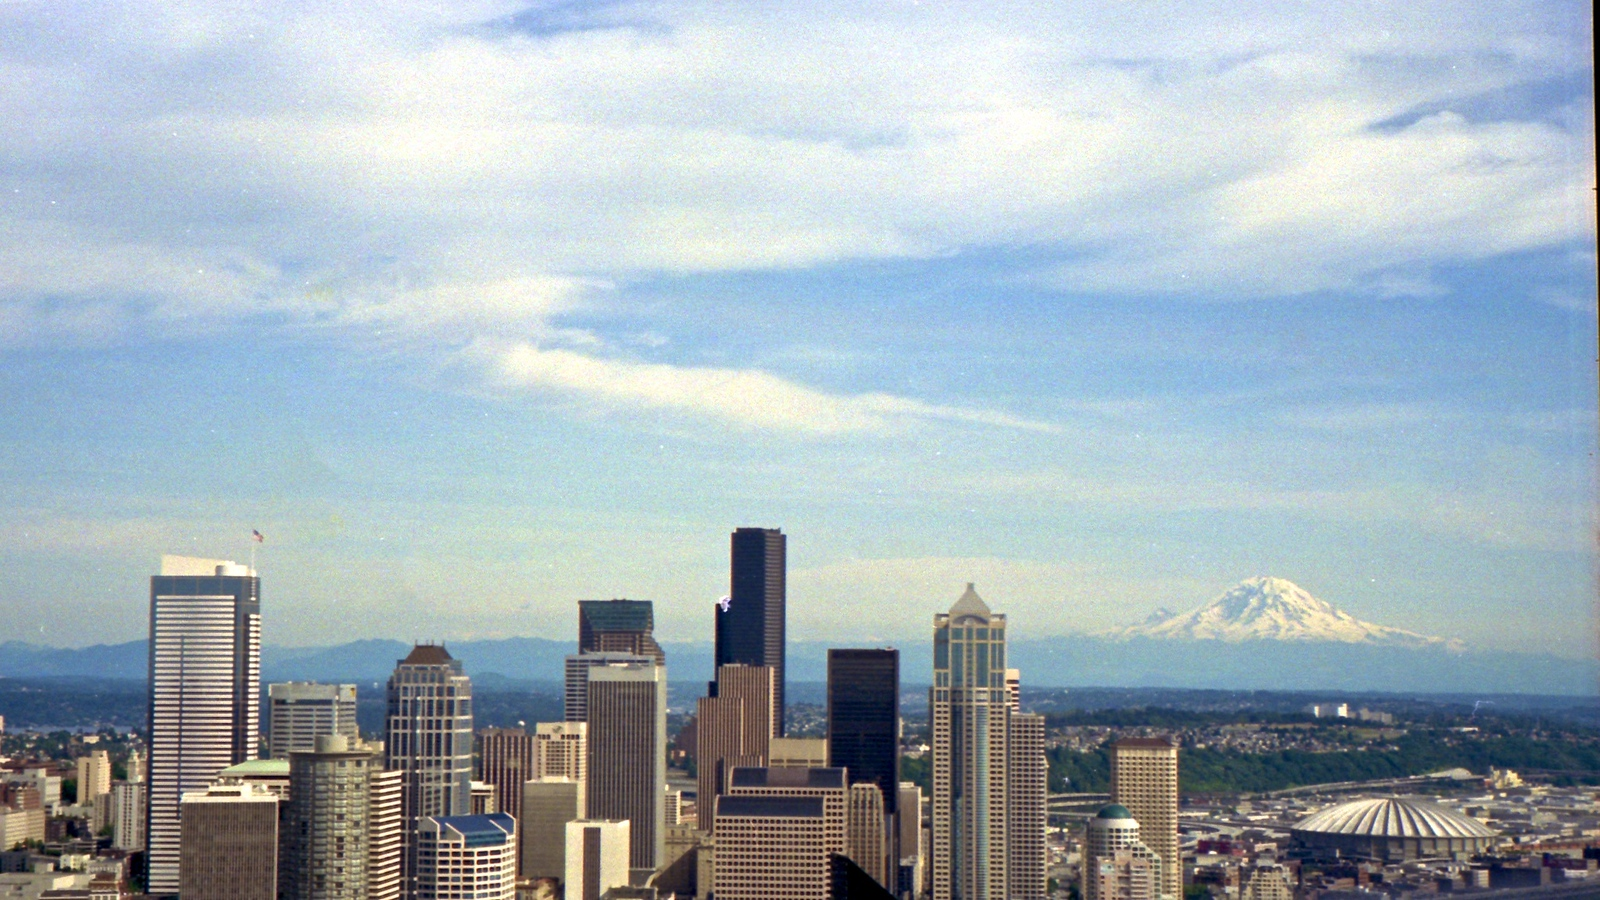 Mount Rainier and Seatt;e Skyline